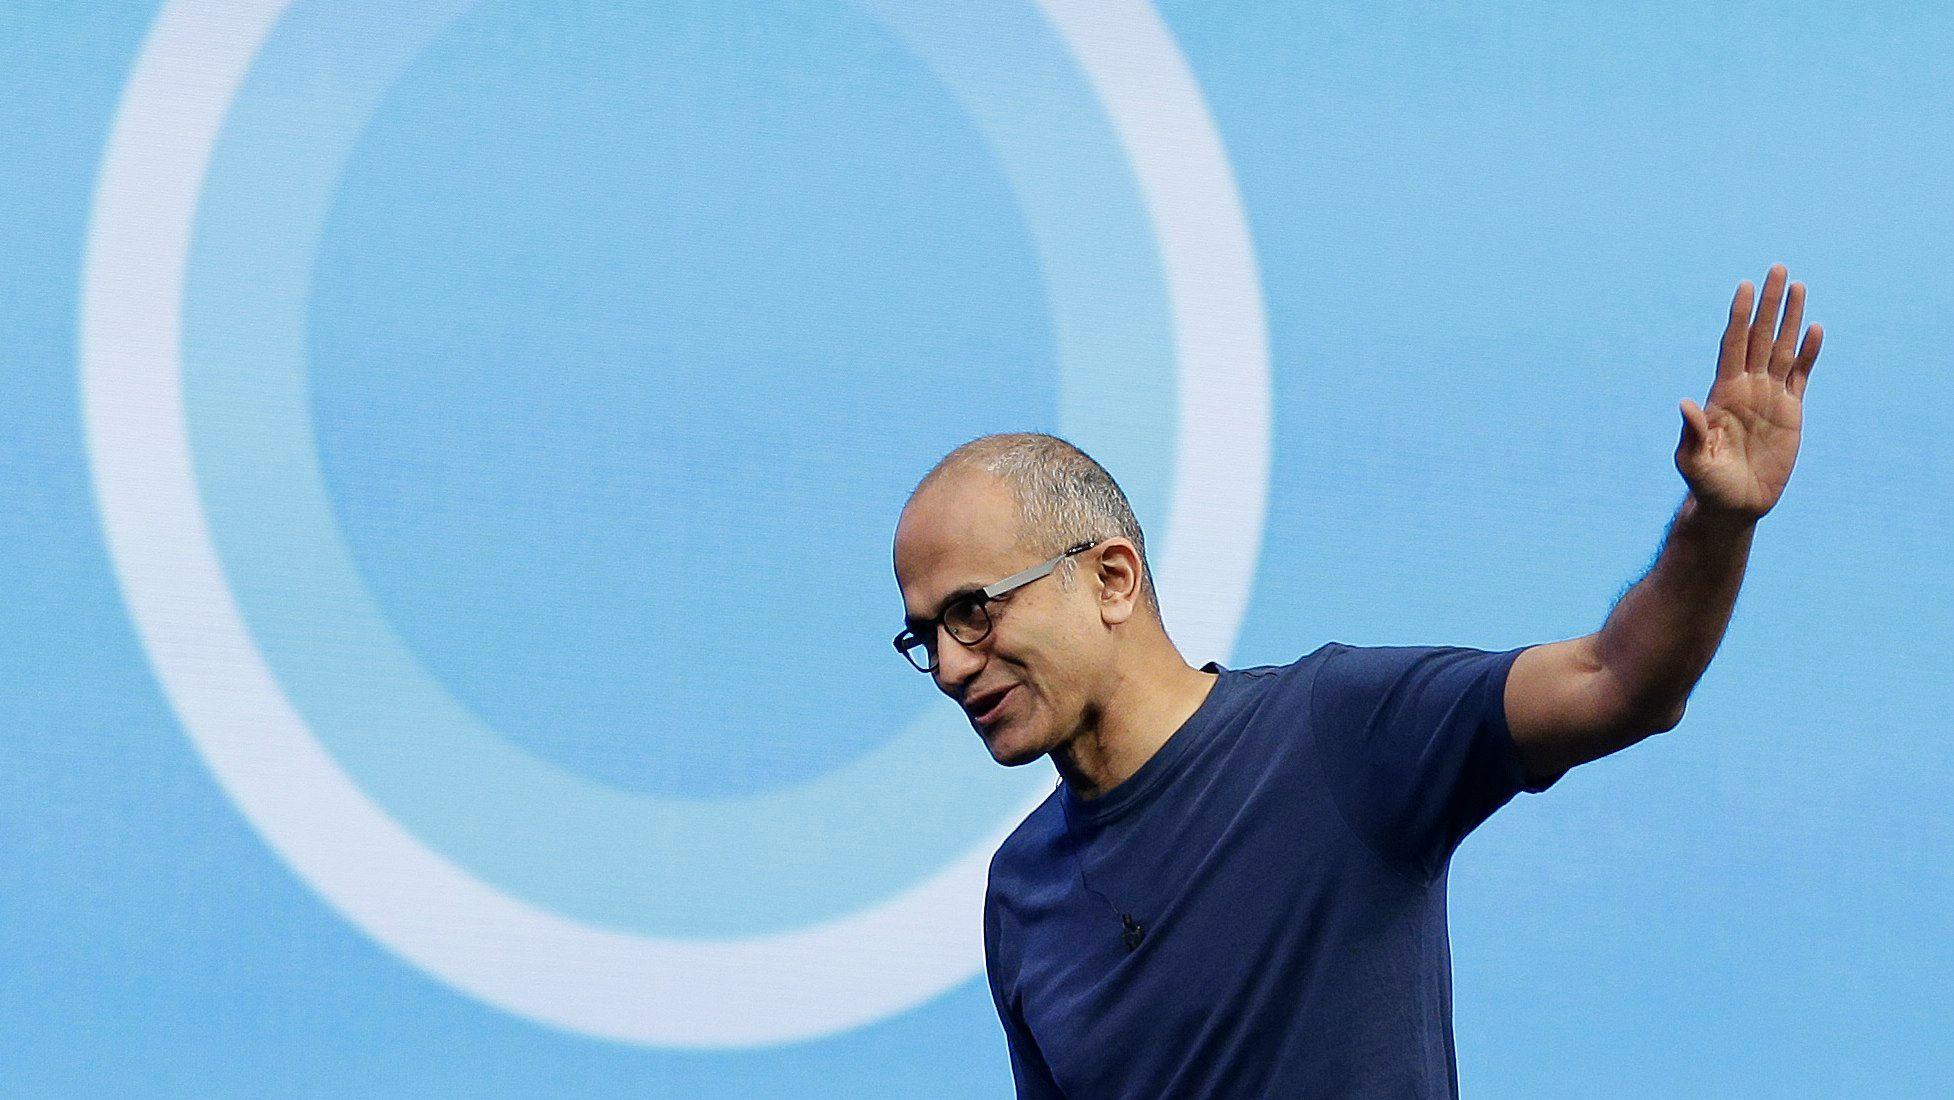 The three traits Microsoft CEO Satya Nadella looks for in leaders